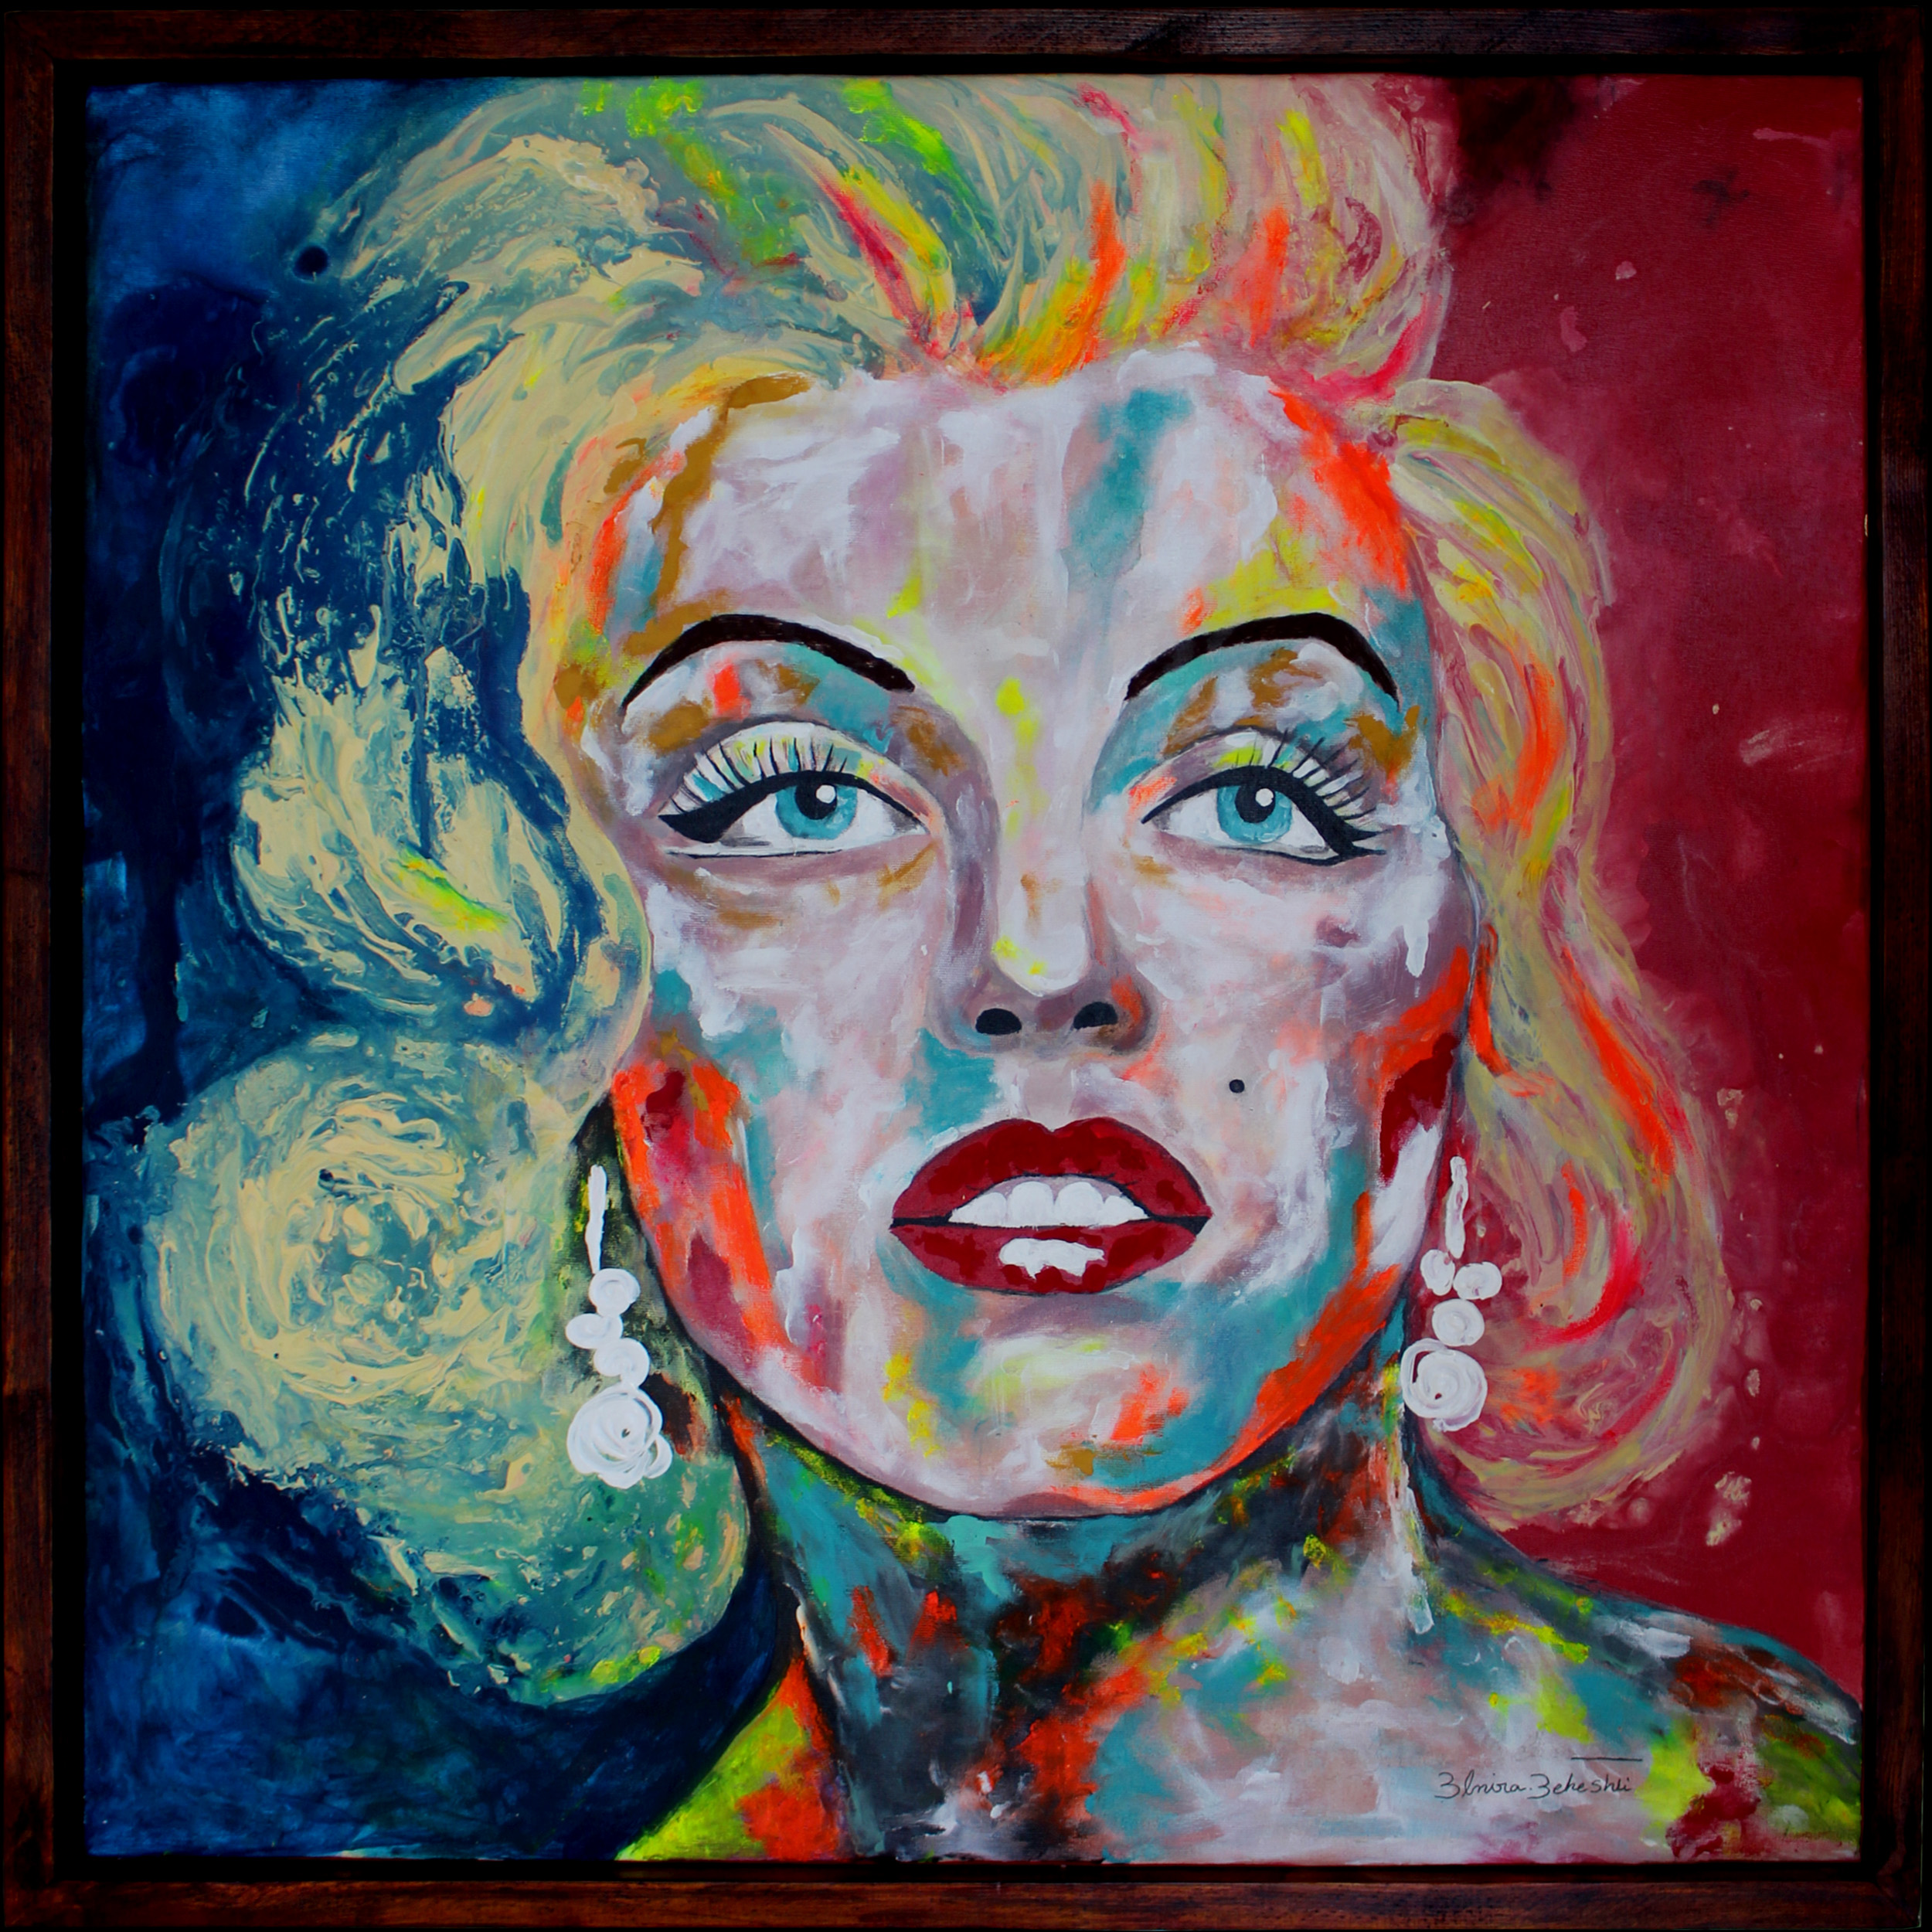 تابلو نقاشی رنگ روغن طرح مرلین مونرو کد EM1004